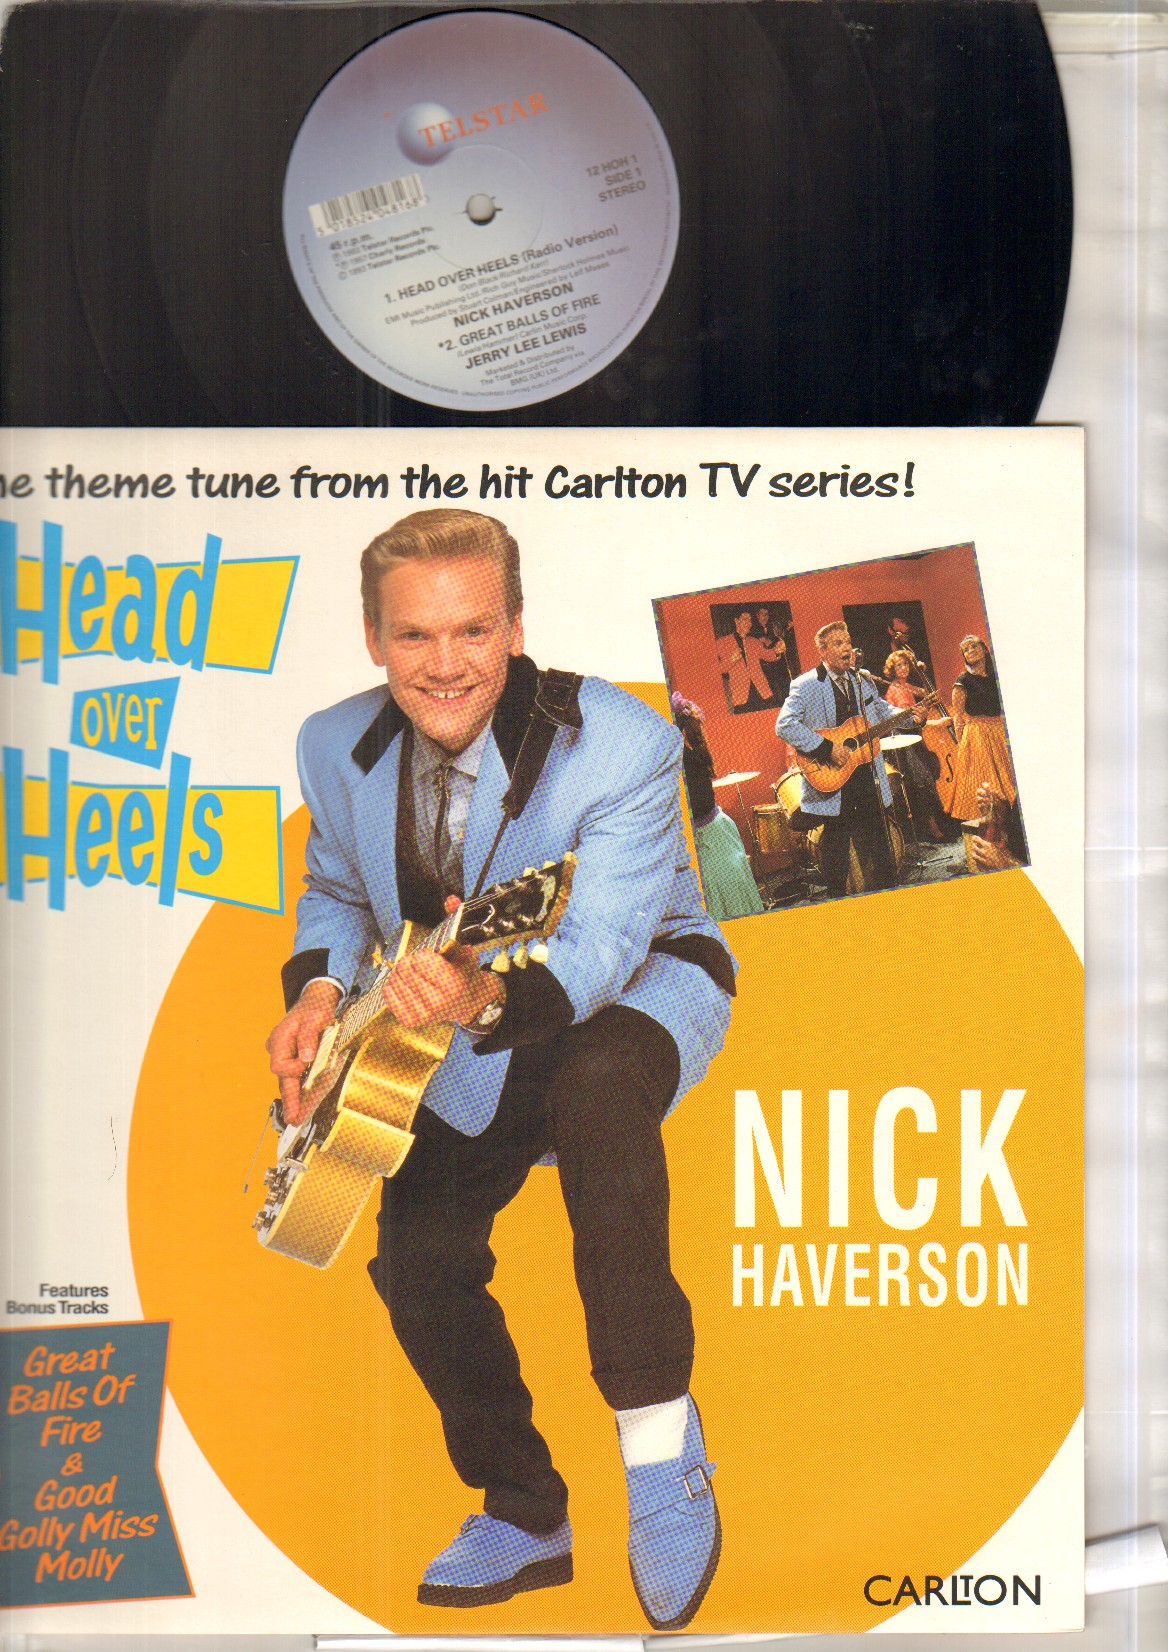 NICK HAVERSON - HEAD OVER HEELS - 12 inch 45 rpm